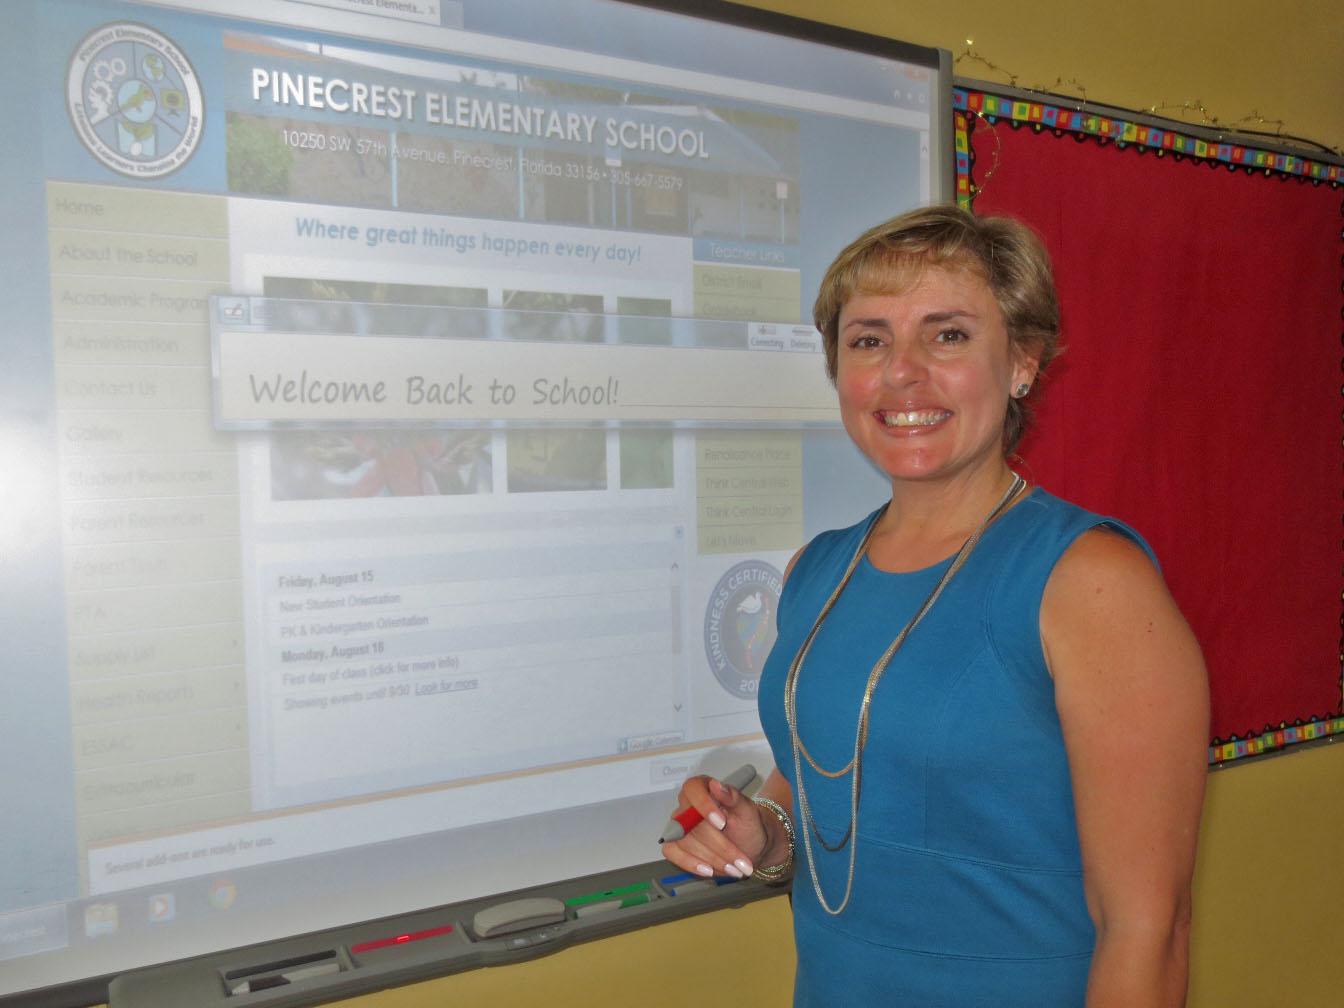 Pinecrest Elementary Principal Marisol Diaz at interactive smartboard